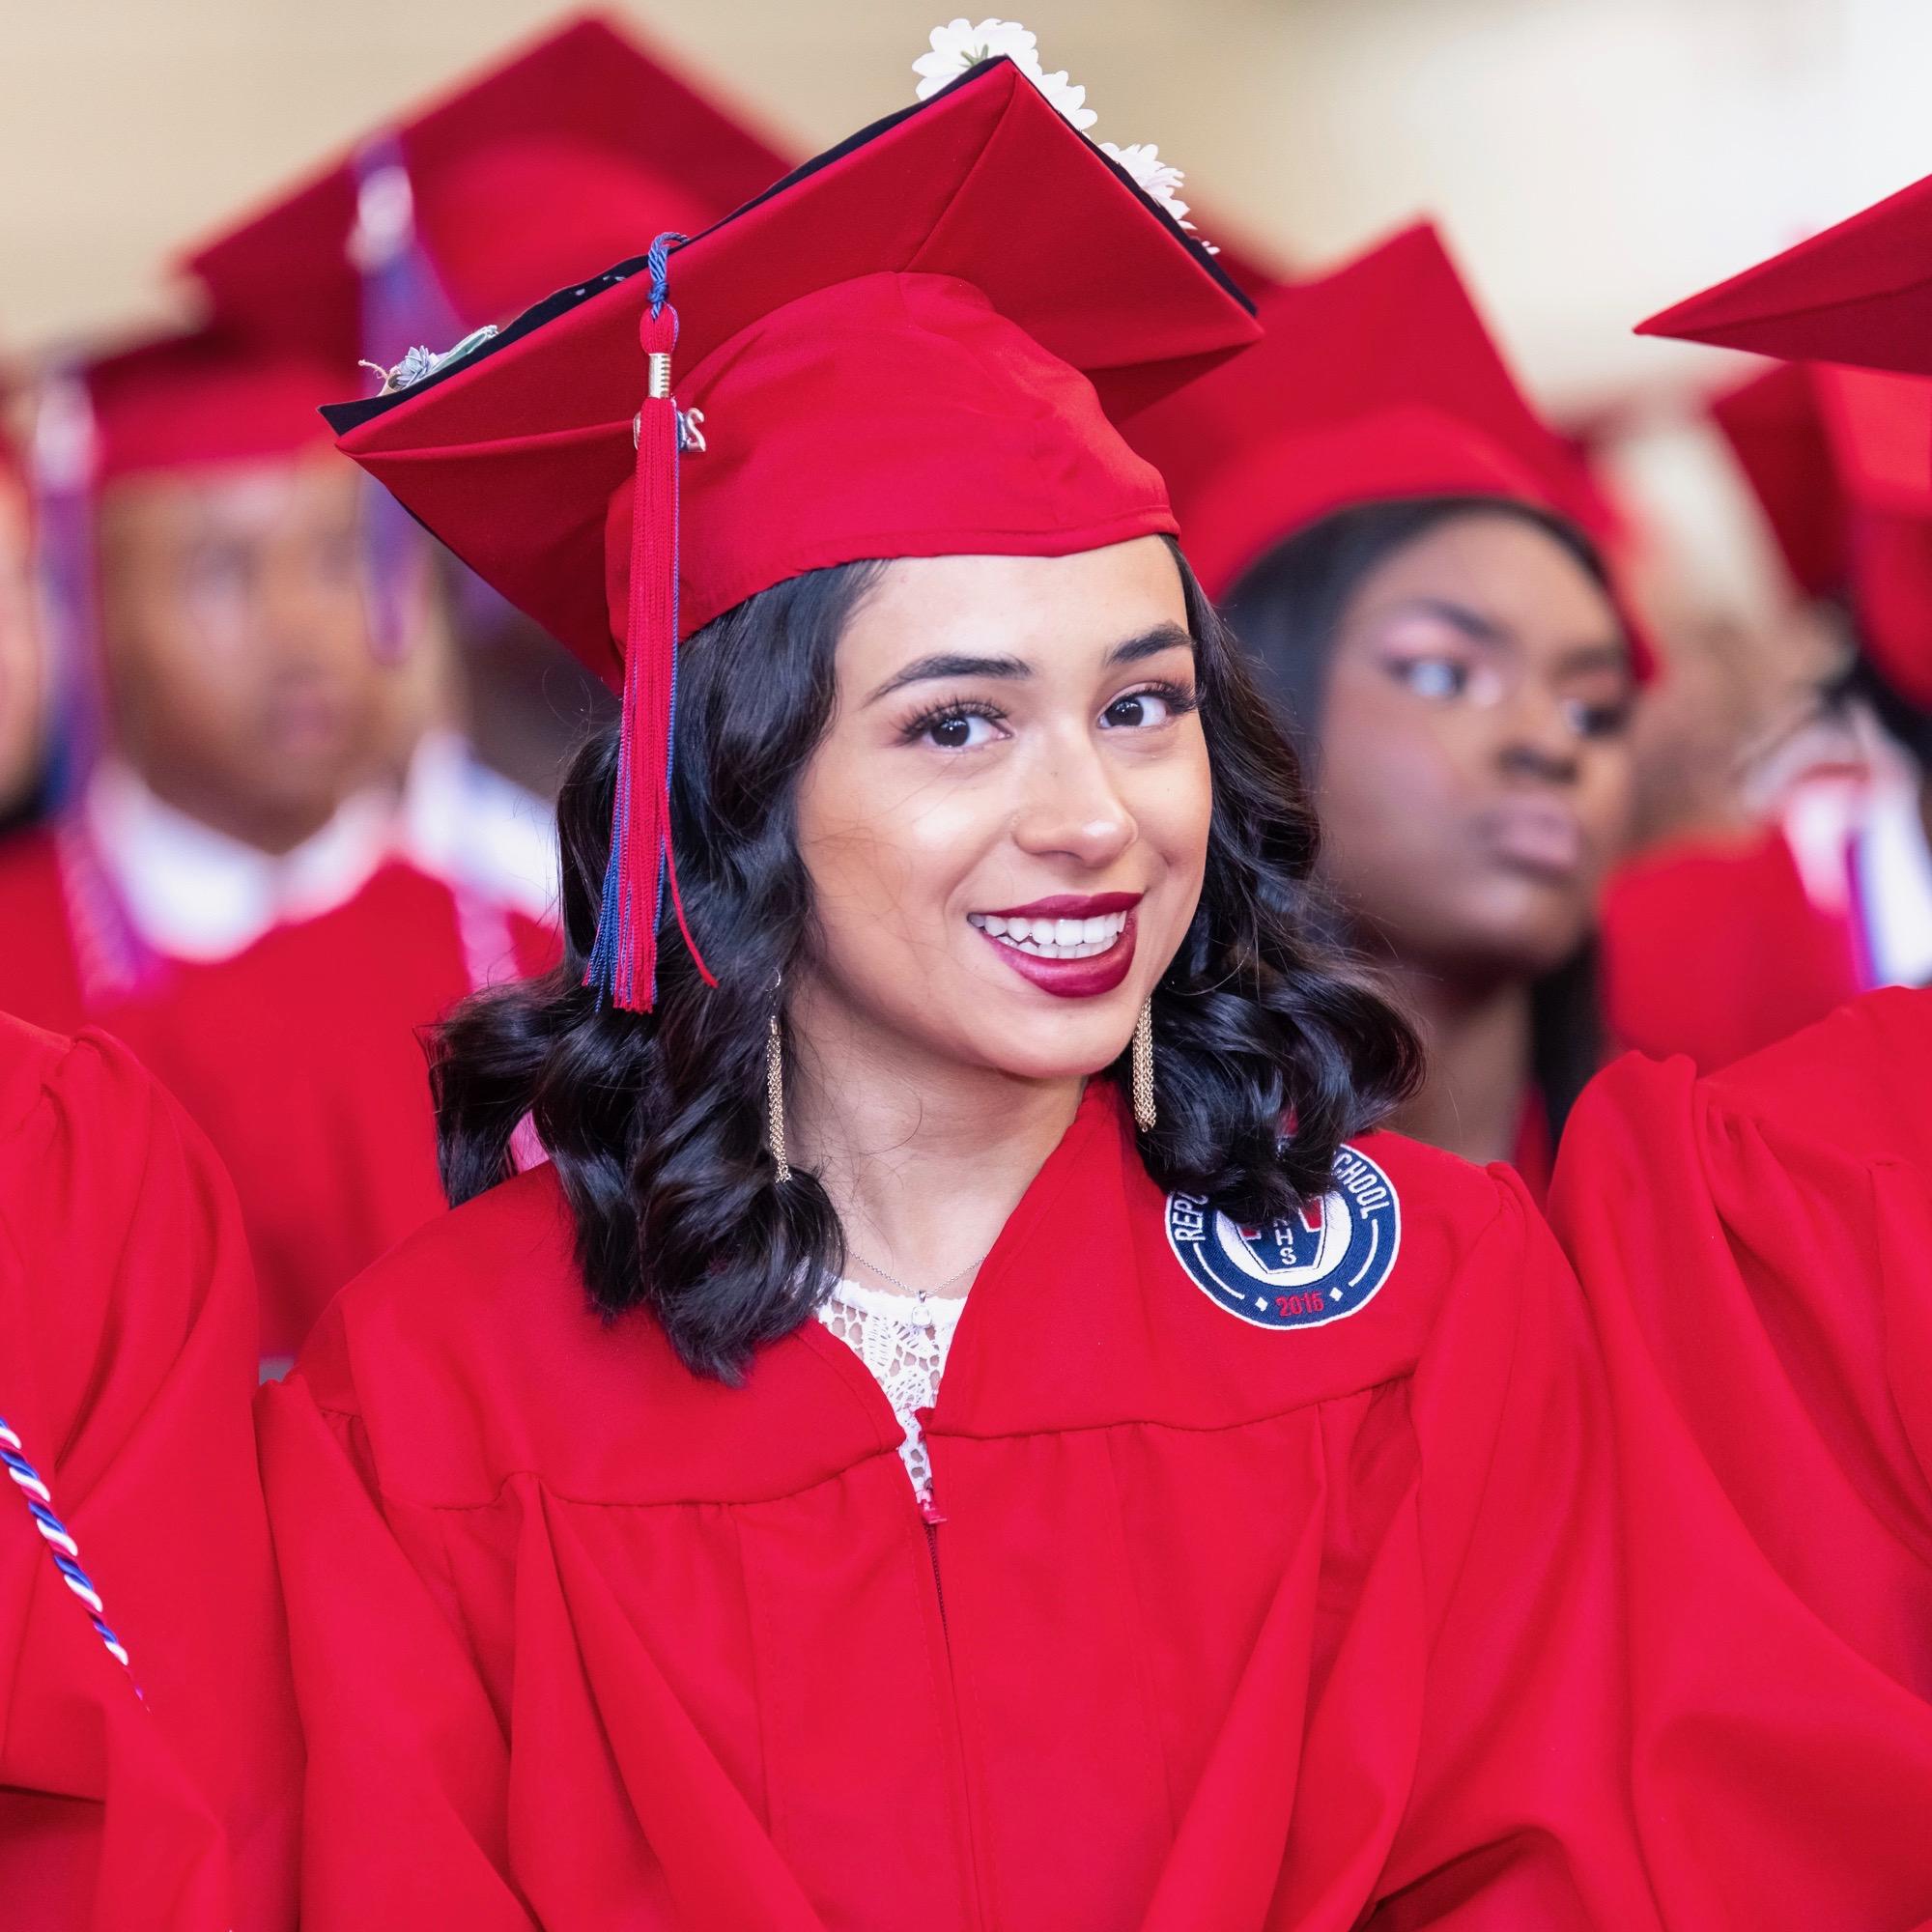 RePublic High School   LEARN MORE